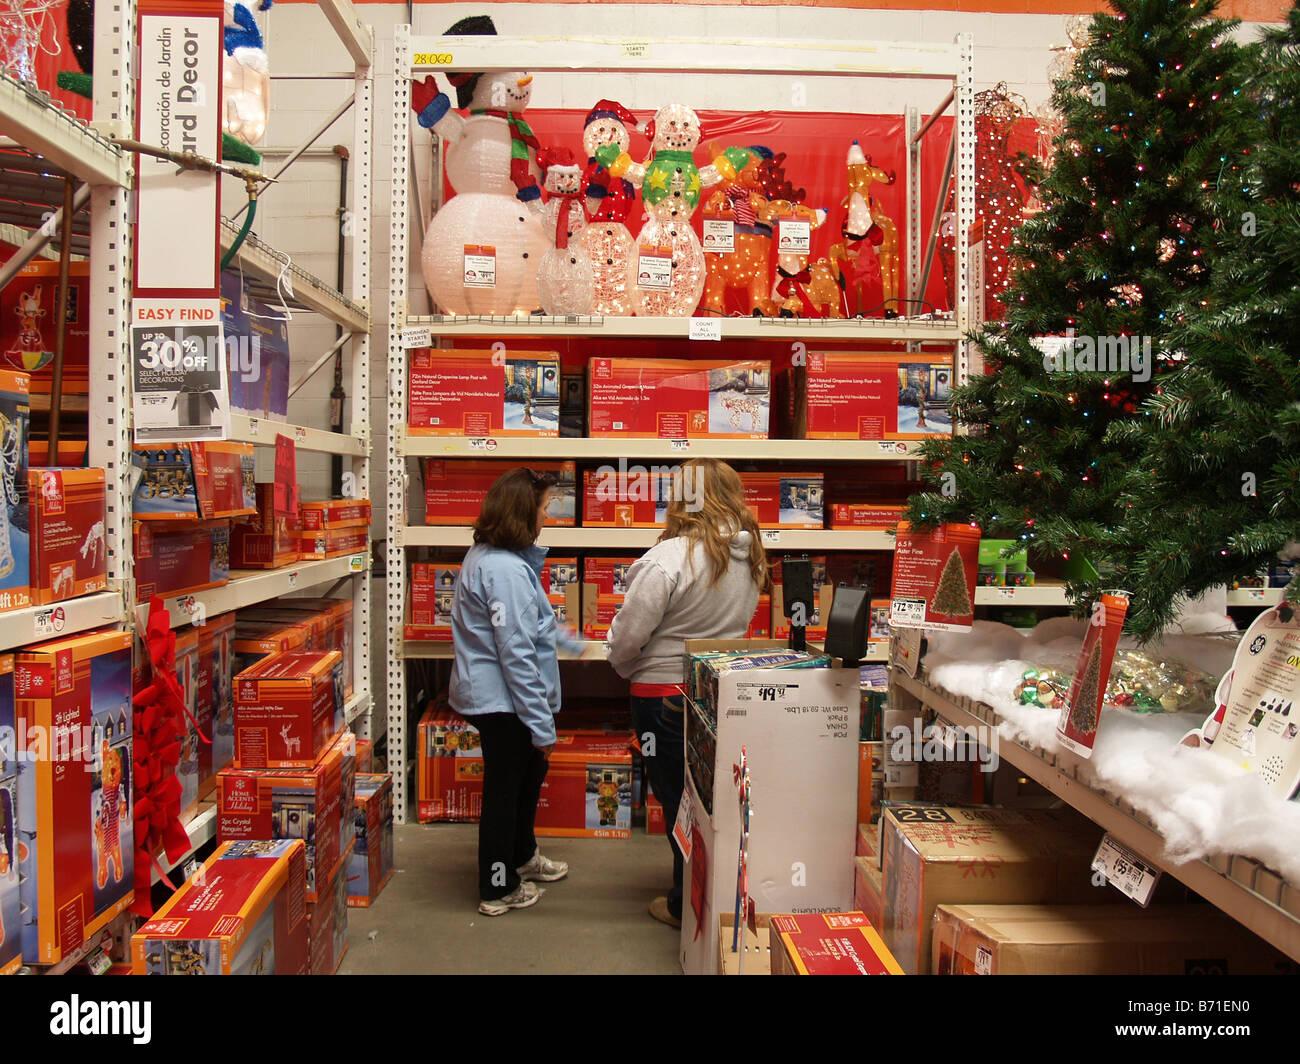 The Home Depot Interior Stock Photos & The Home Depot Interior